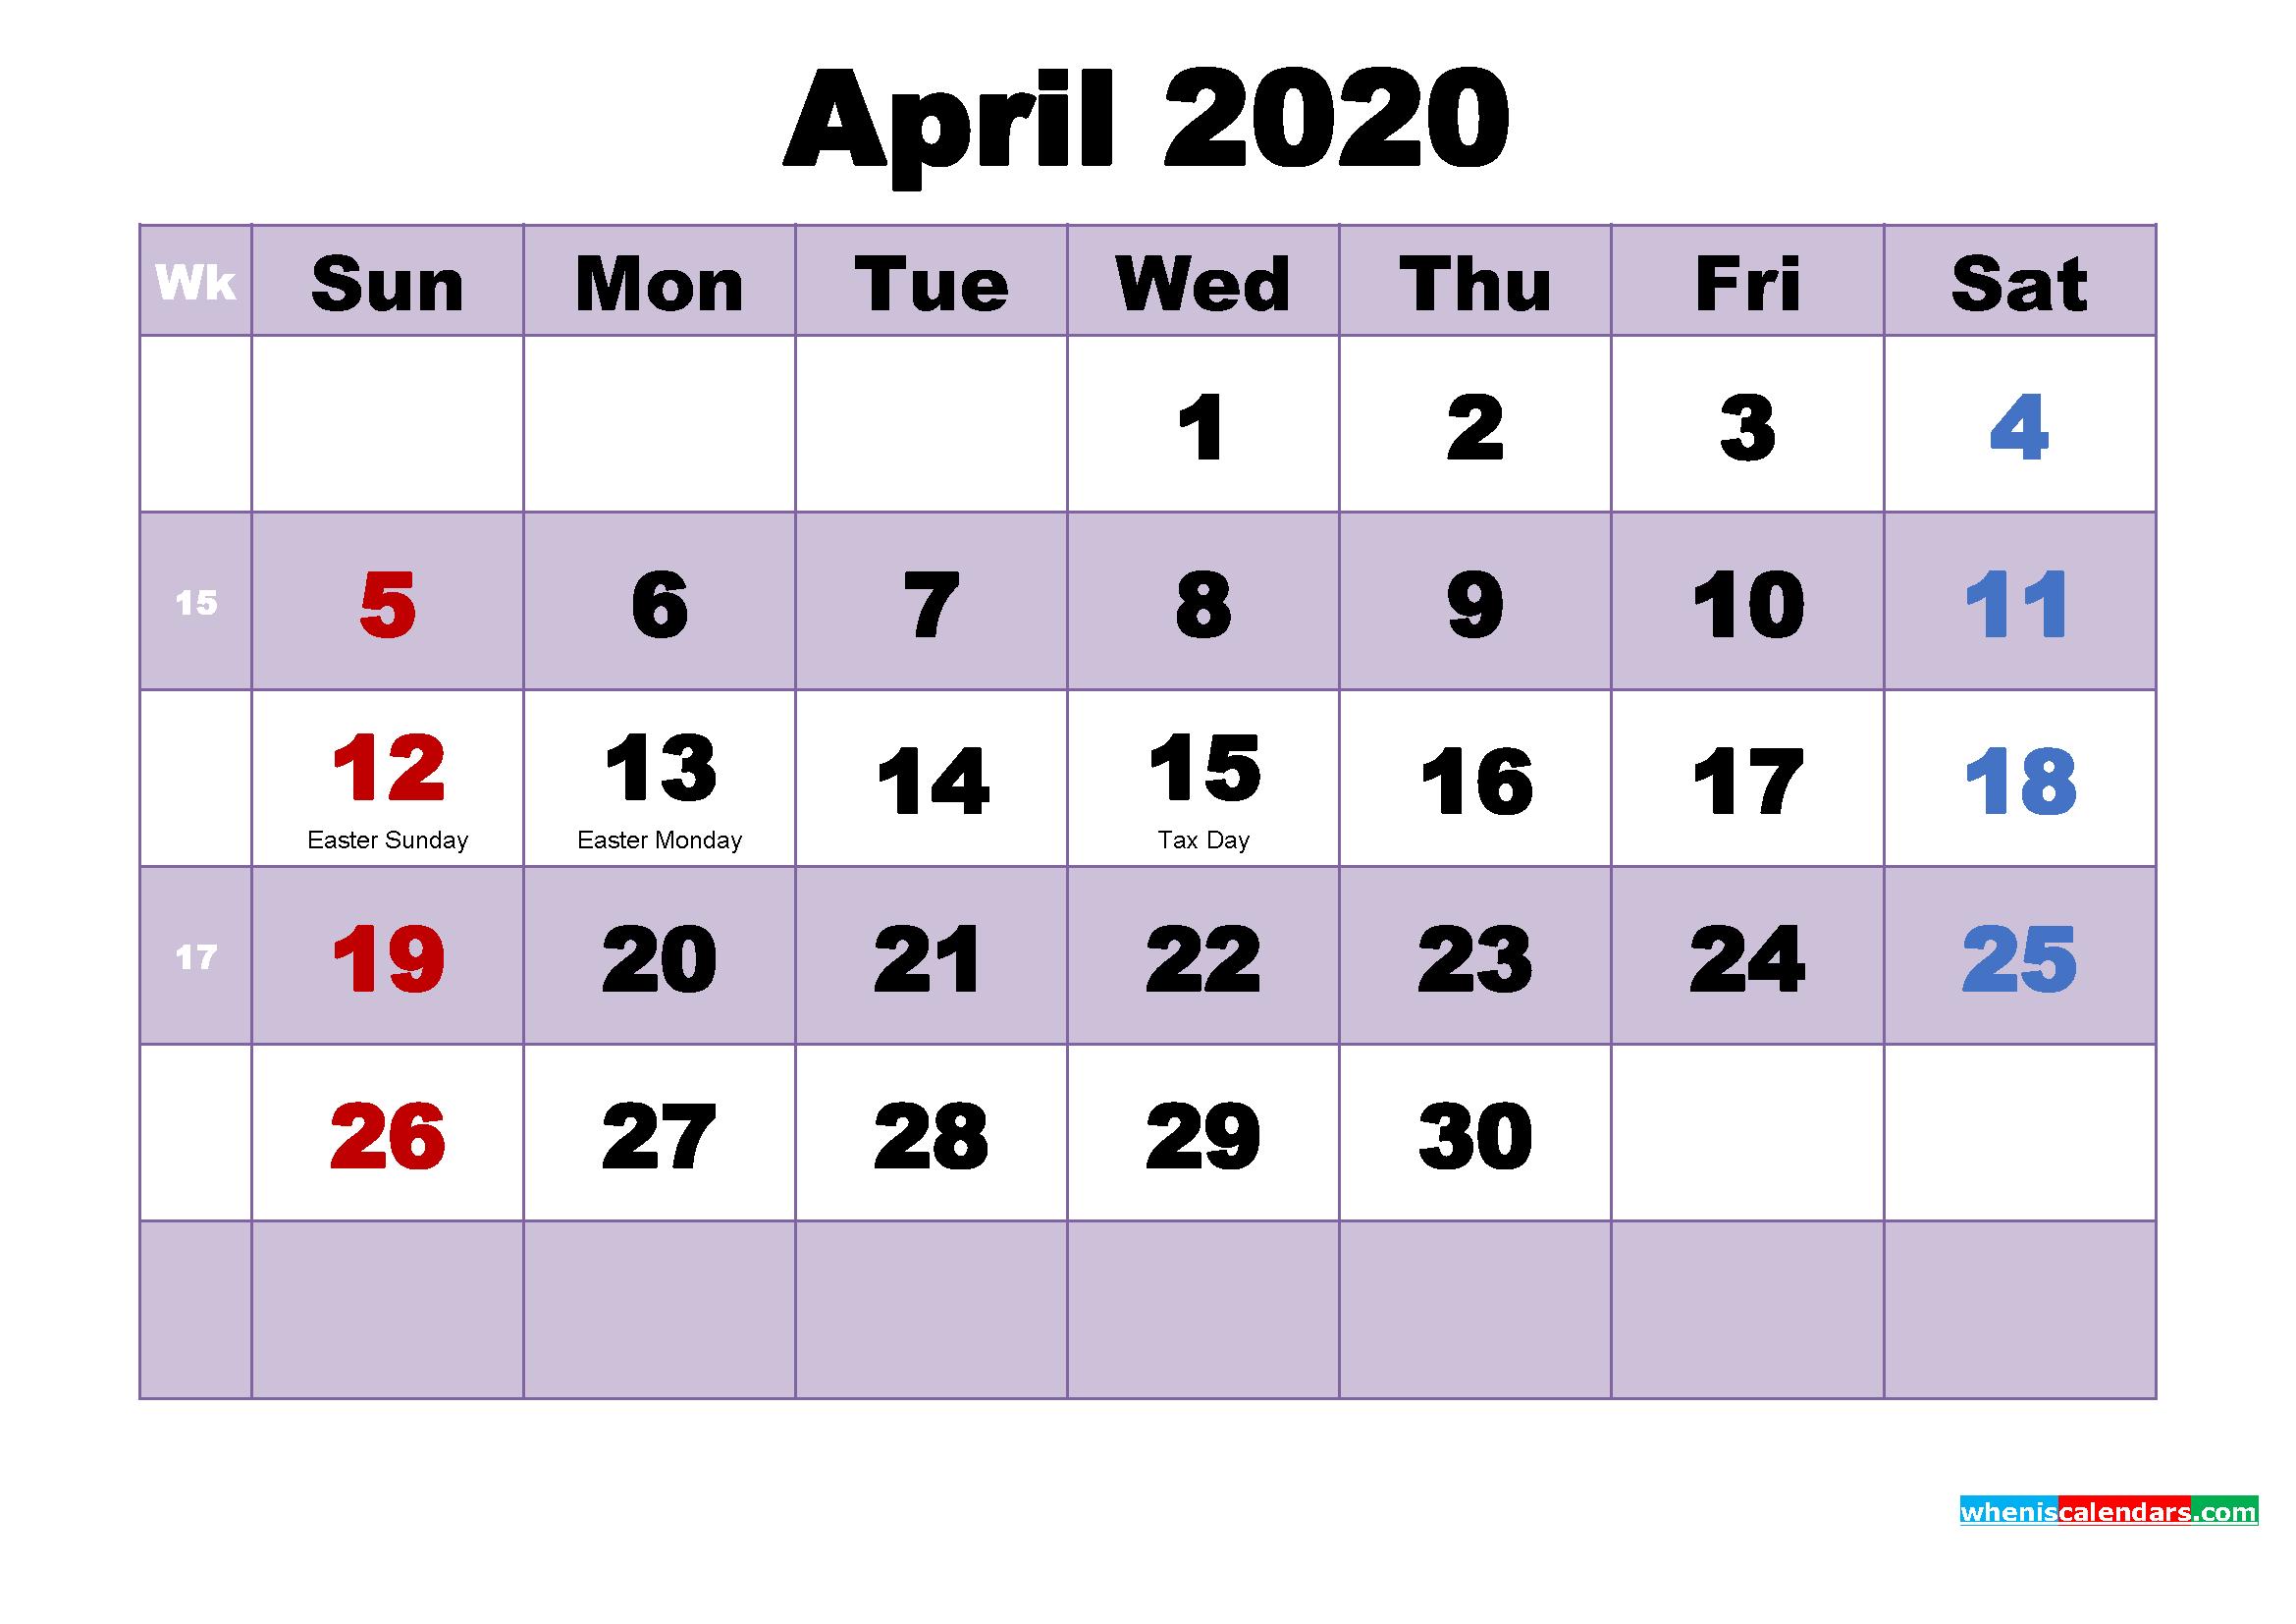 April 2020 Calendar Wallpaper Free Download